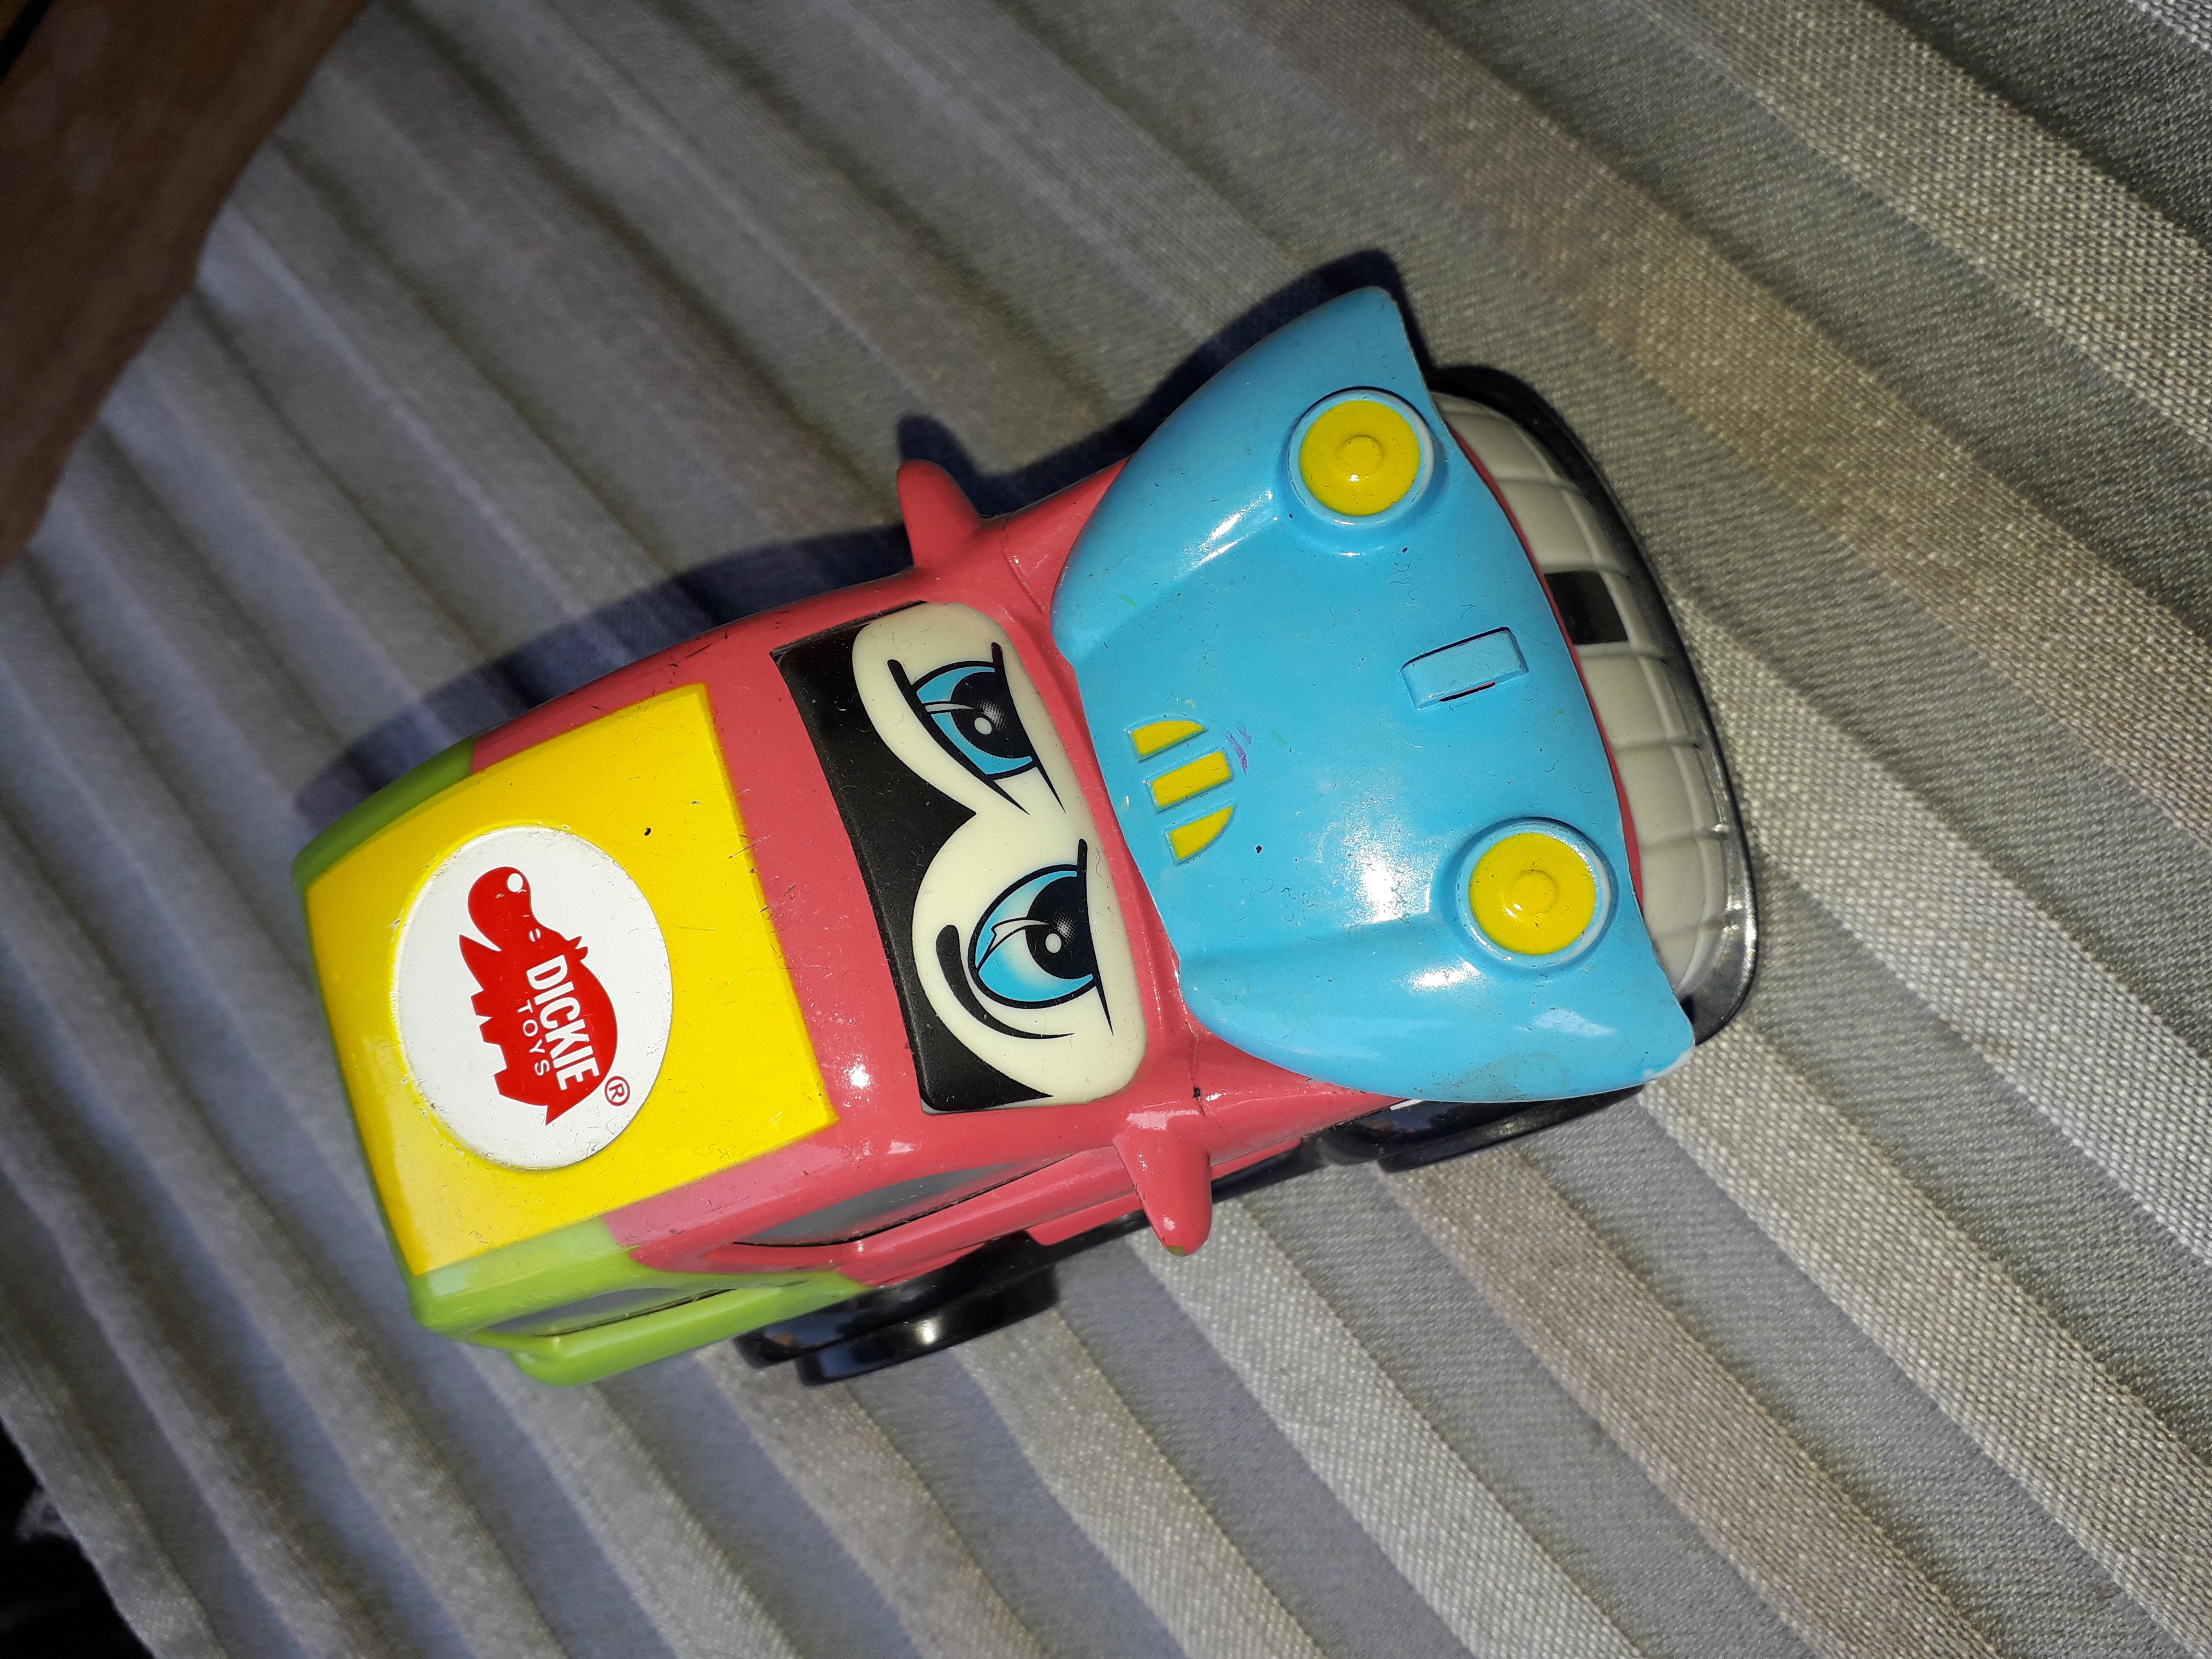 Auto Dickie incl Batterie tauschen